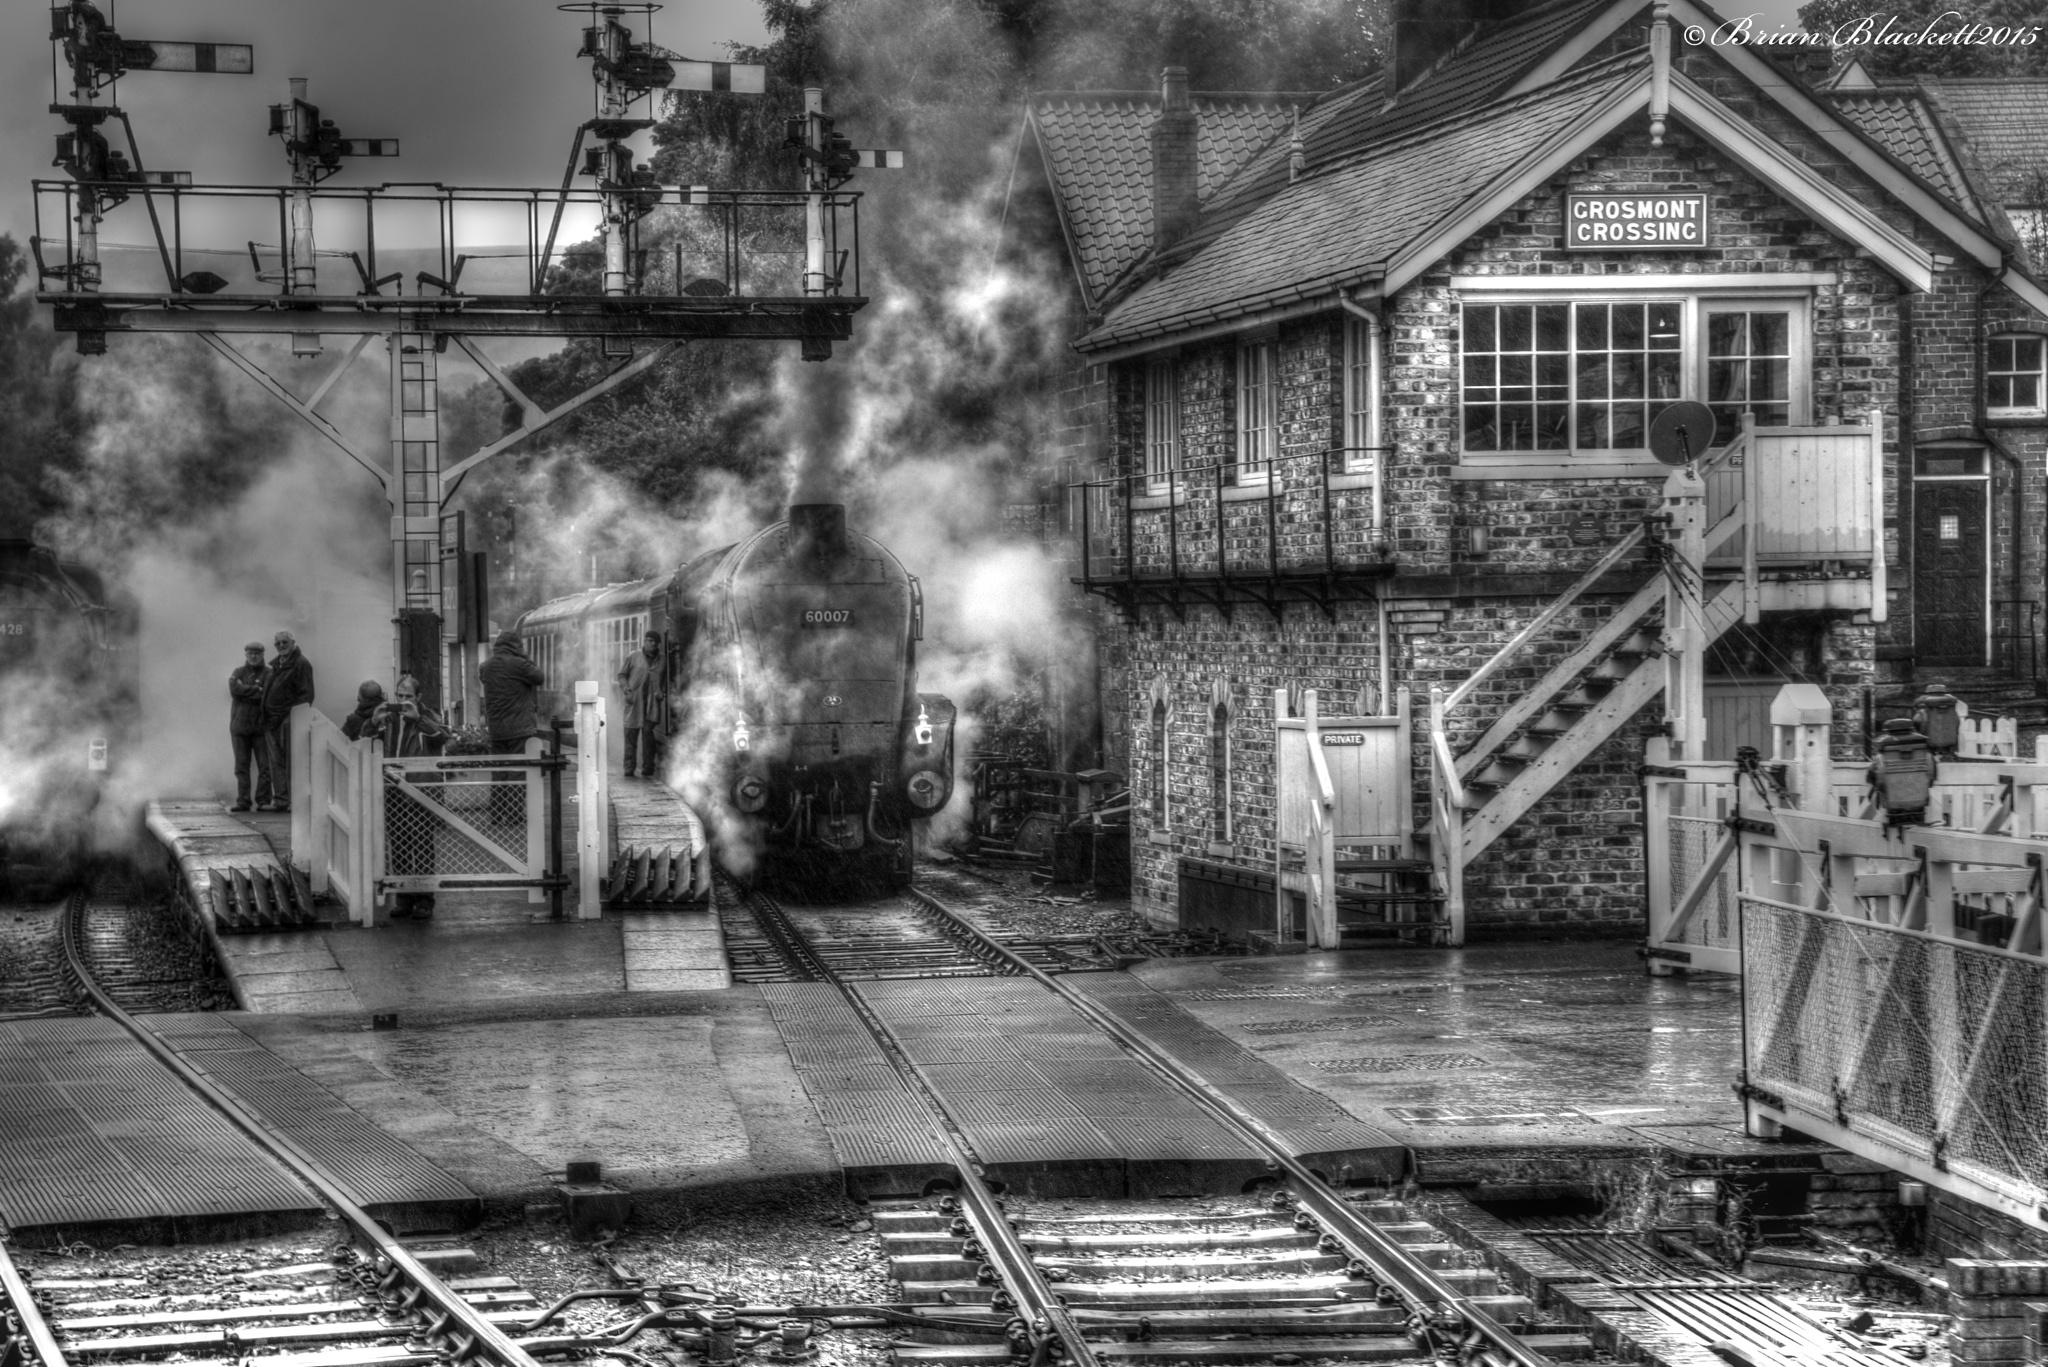 North Yorkshire Moors Railway by brianblackett